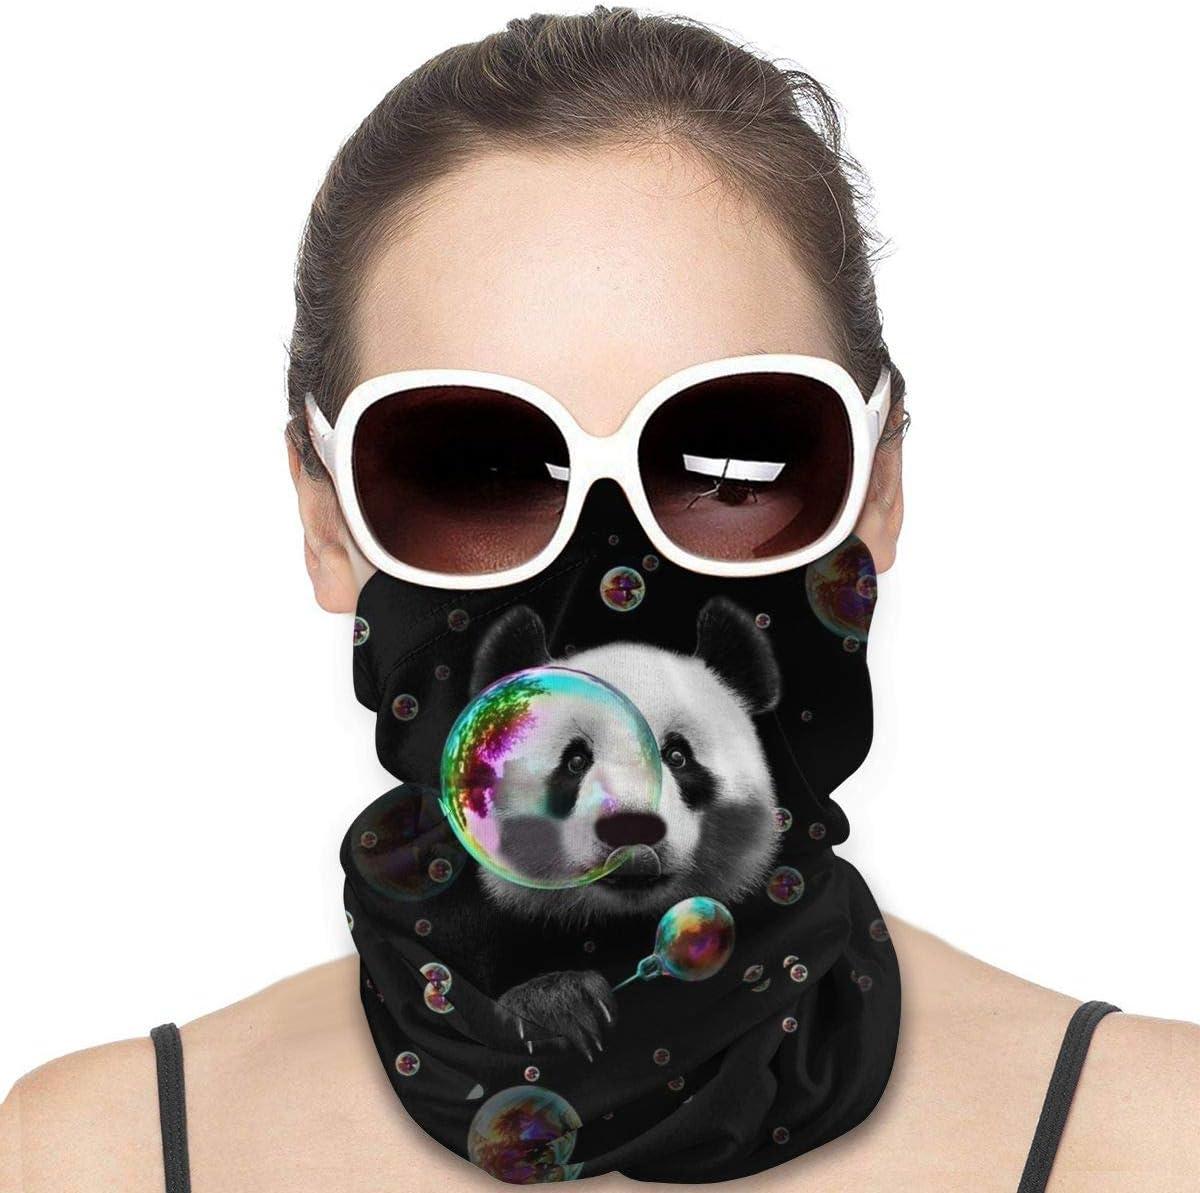 JinSPef Bandana Face Mask Smoking Rasta Music Lion with Headphoness for Men Neck Gaiter Head Bands Face Cover Headbands Neck Gaiter